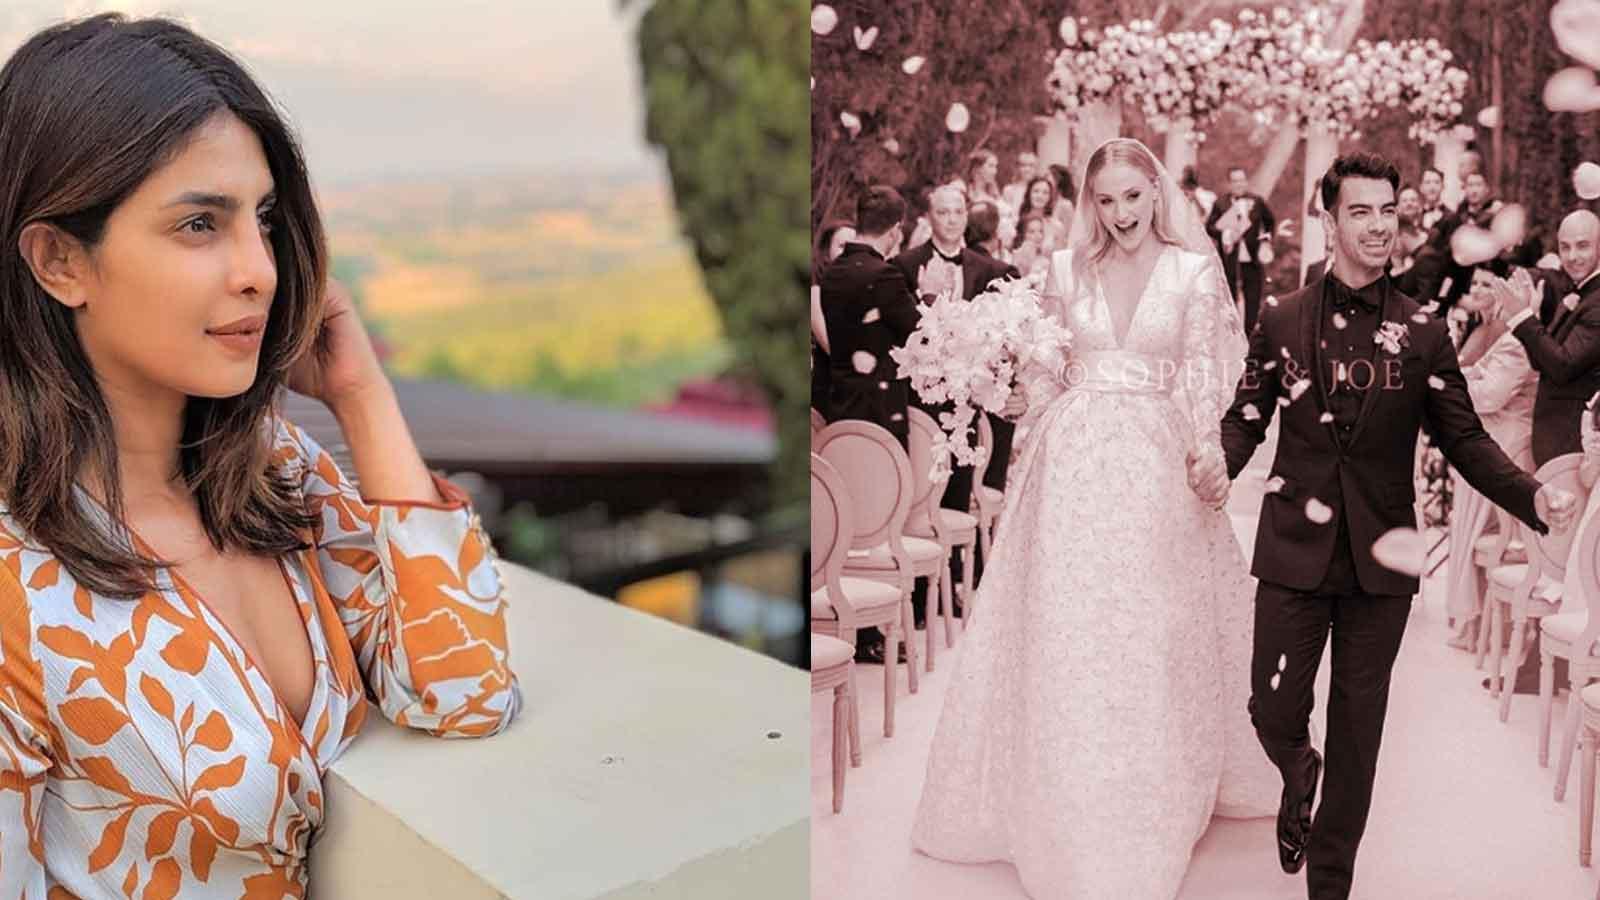 Priyanka Chopra congratulates brother-in-law Joe Jonas and his wife Sophie Turner on wedding